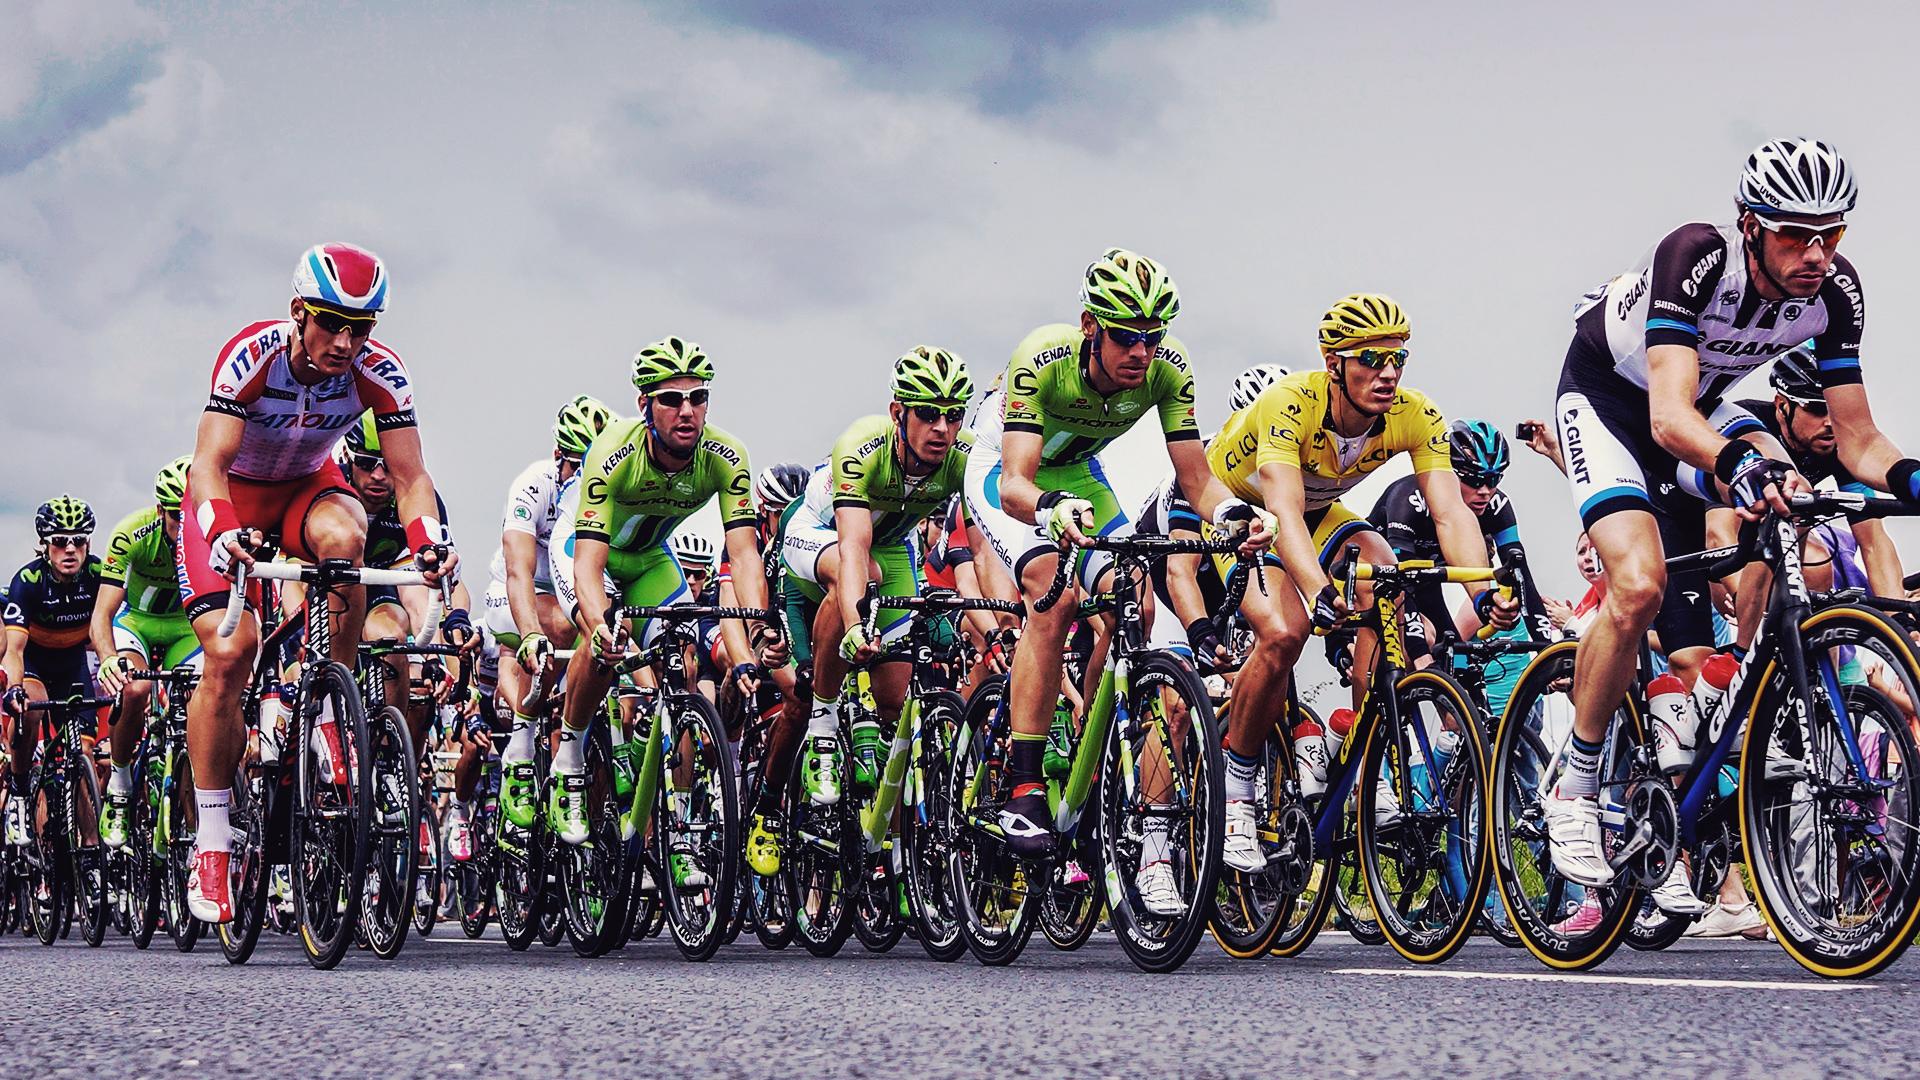 Download Tour De France Wallpaper Gallery 1920x1080